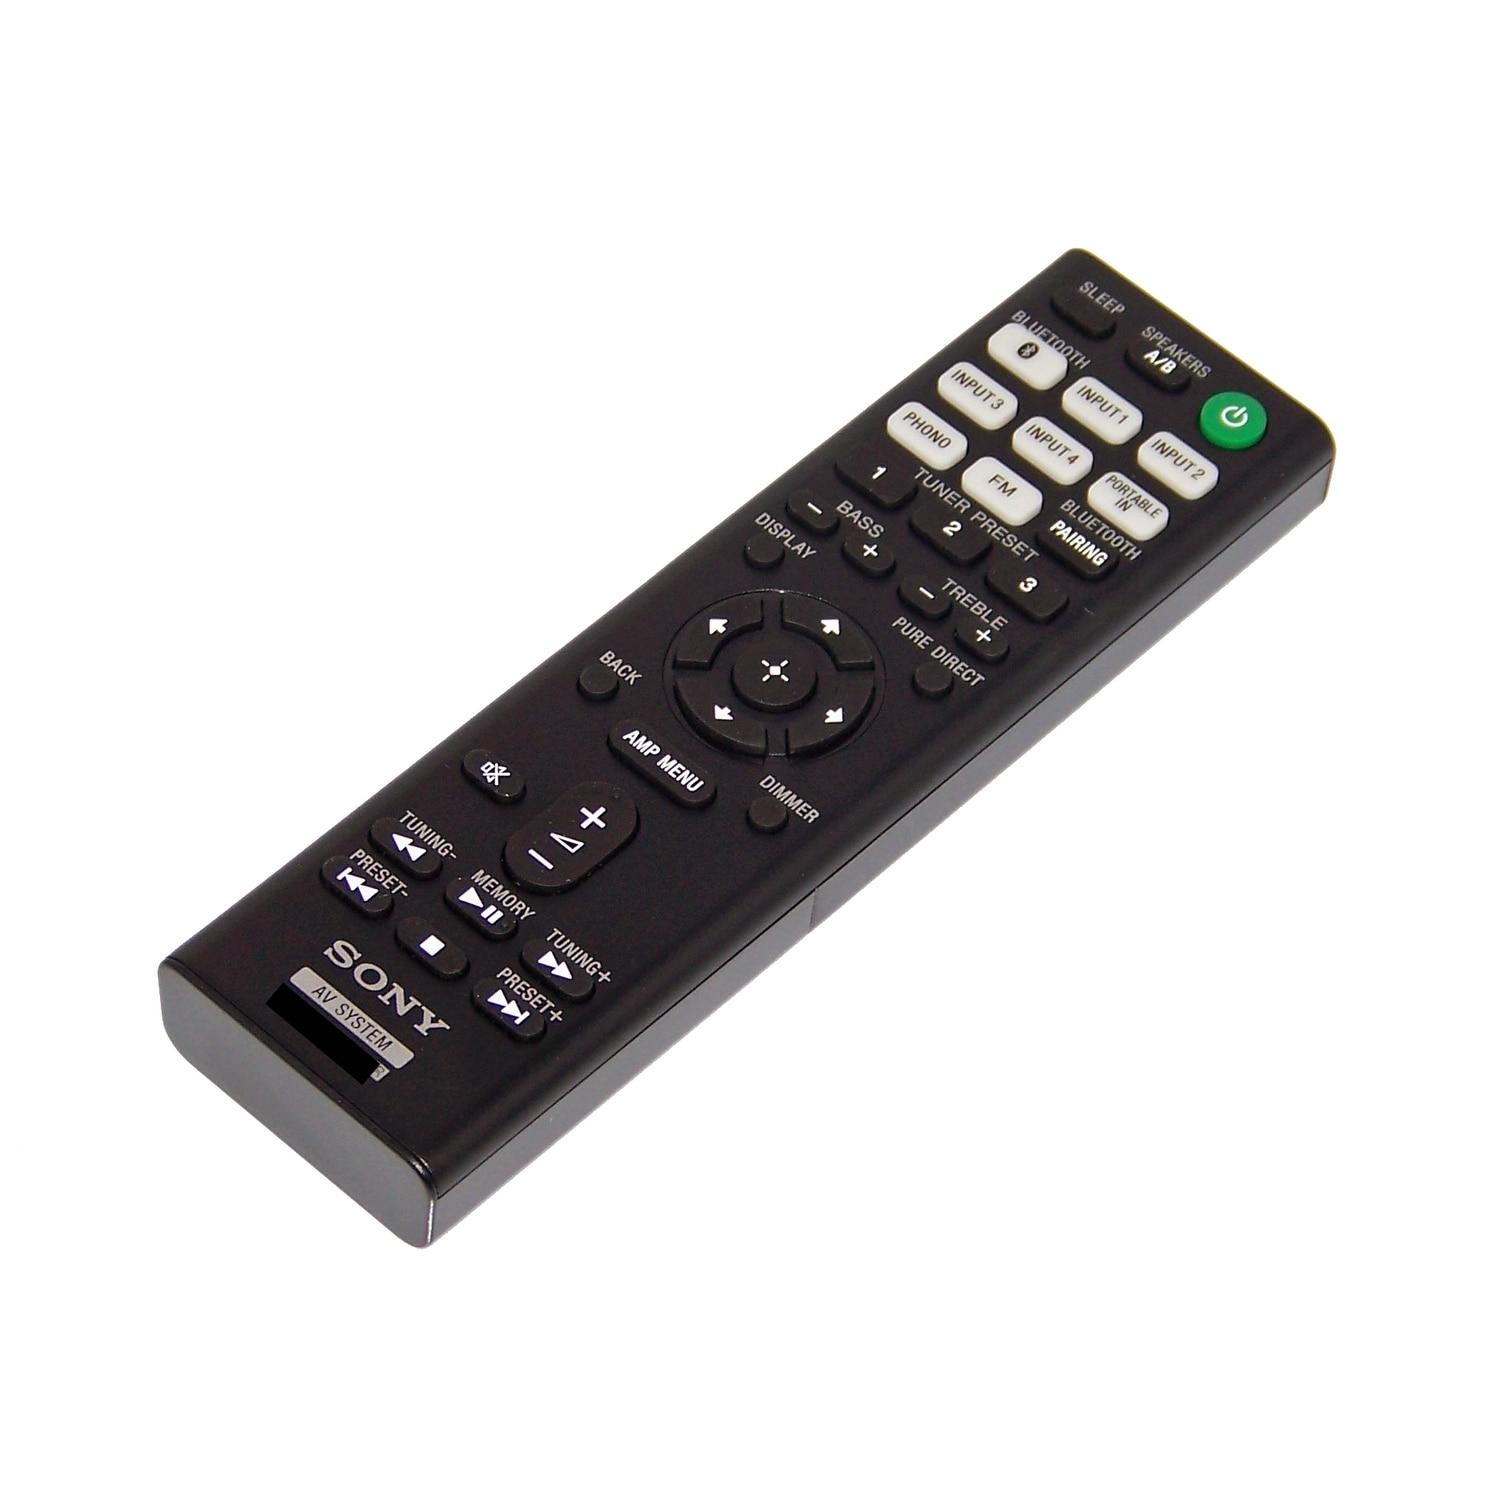 STR-DH550 STR-DH740 STR-DH750 STRDH740 OEM Sony HDMI Connector for STRDH550 STRDH750